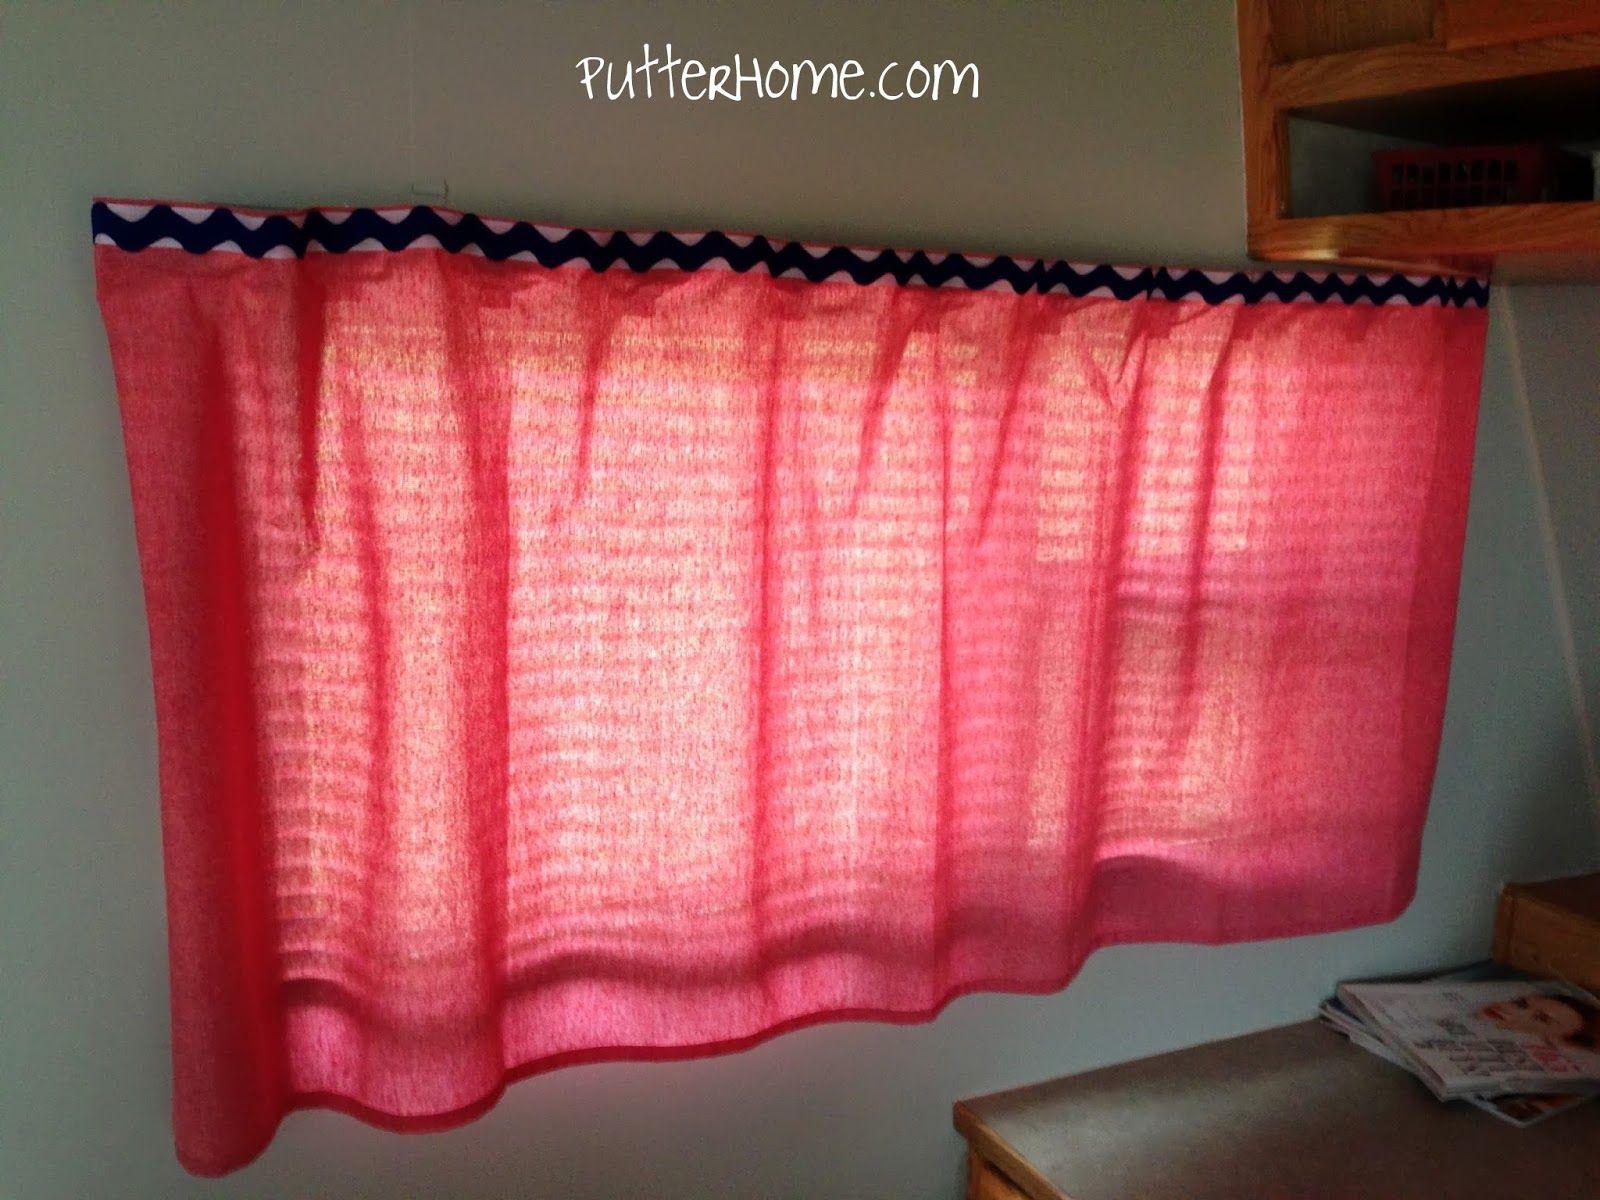 Putter Home | Camper Makeover   No Sew RV Camper Curtains